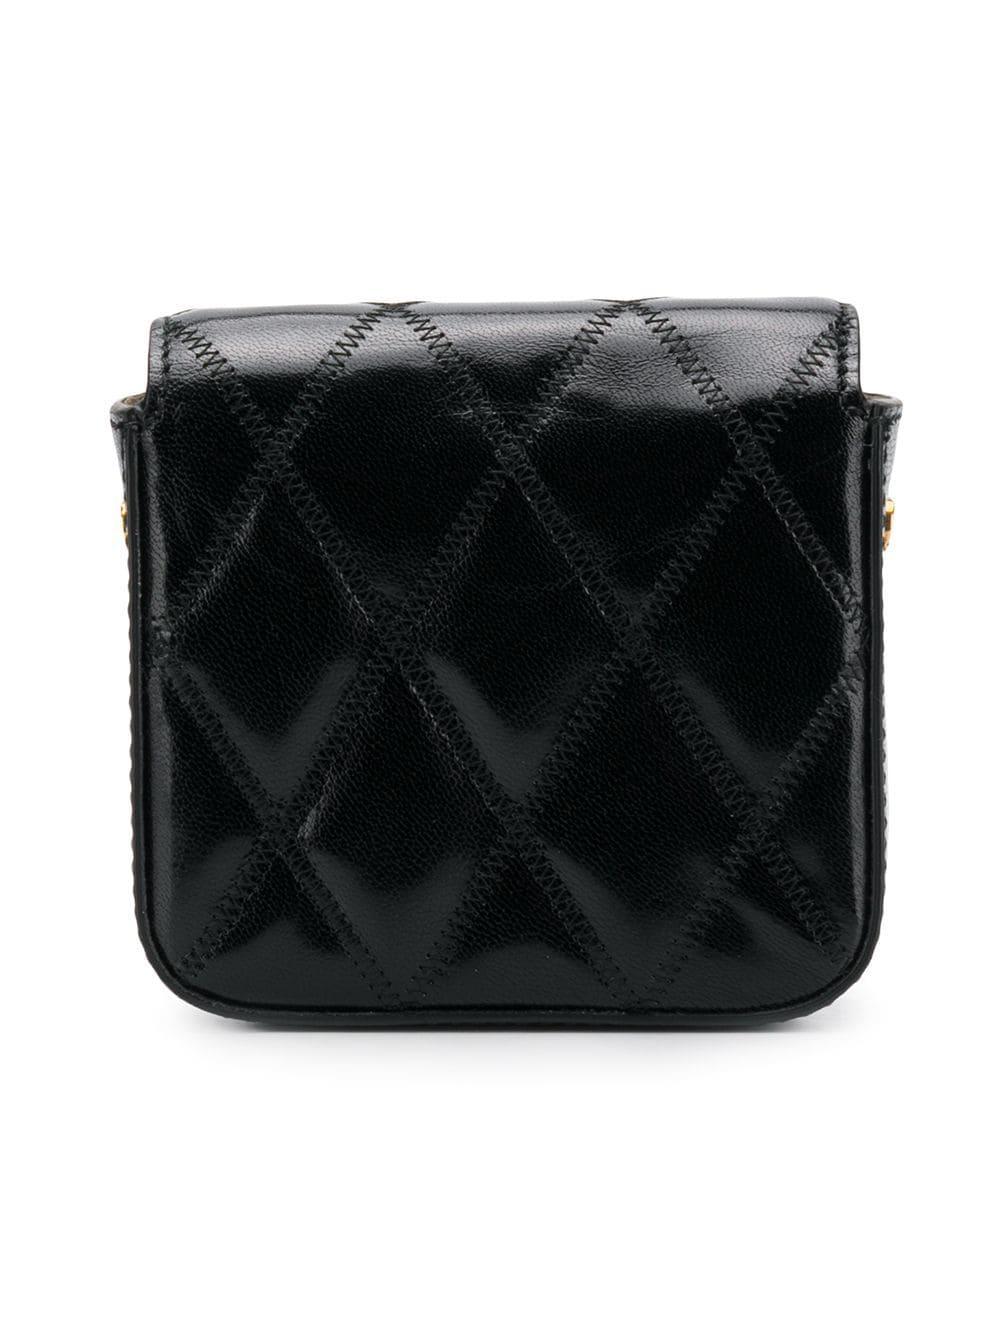 e85076db6875 Givenchy - Black Nano Pocket Pouch - Lyst. View fullscreen